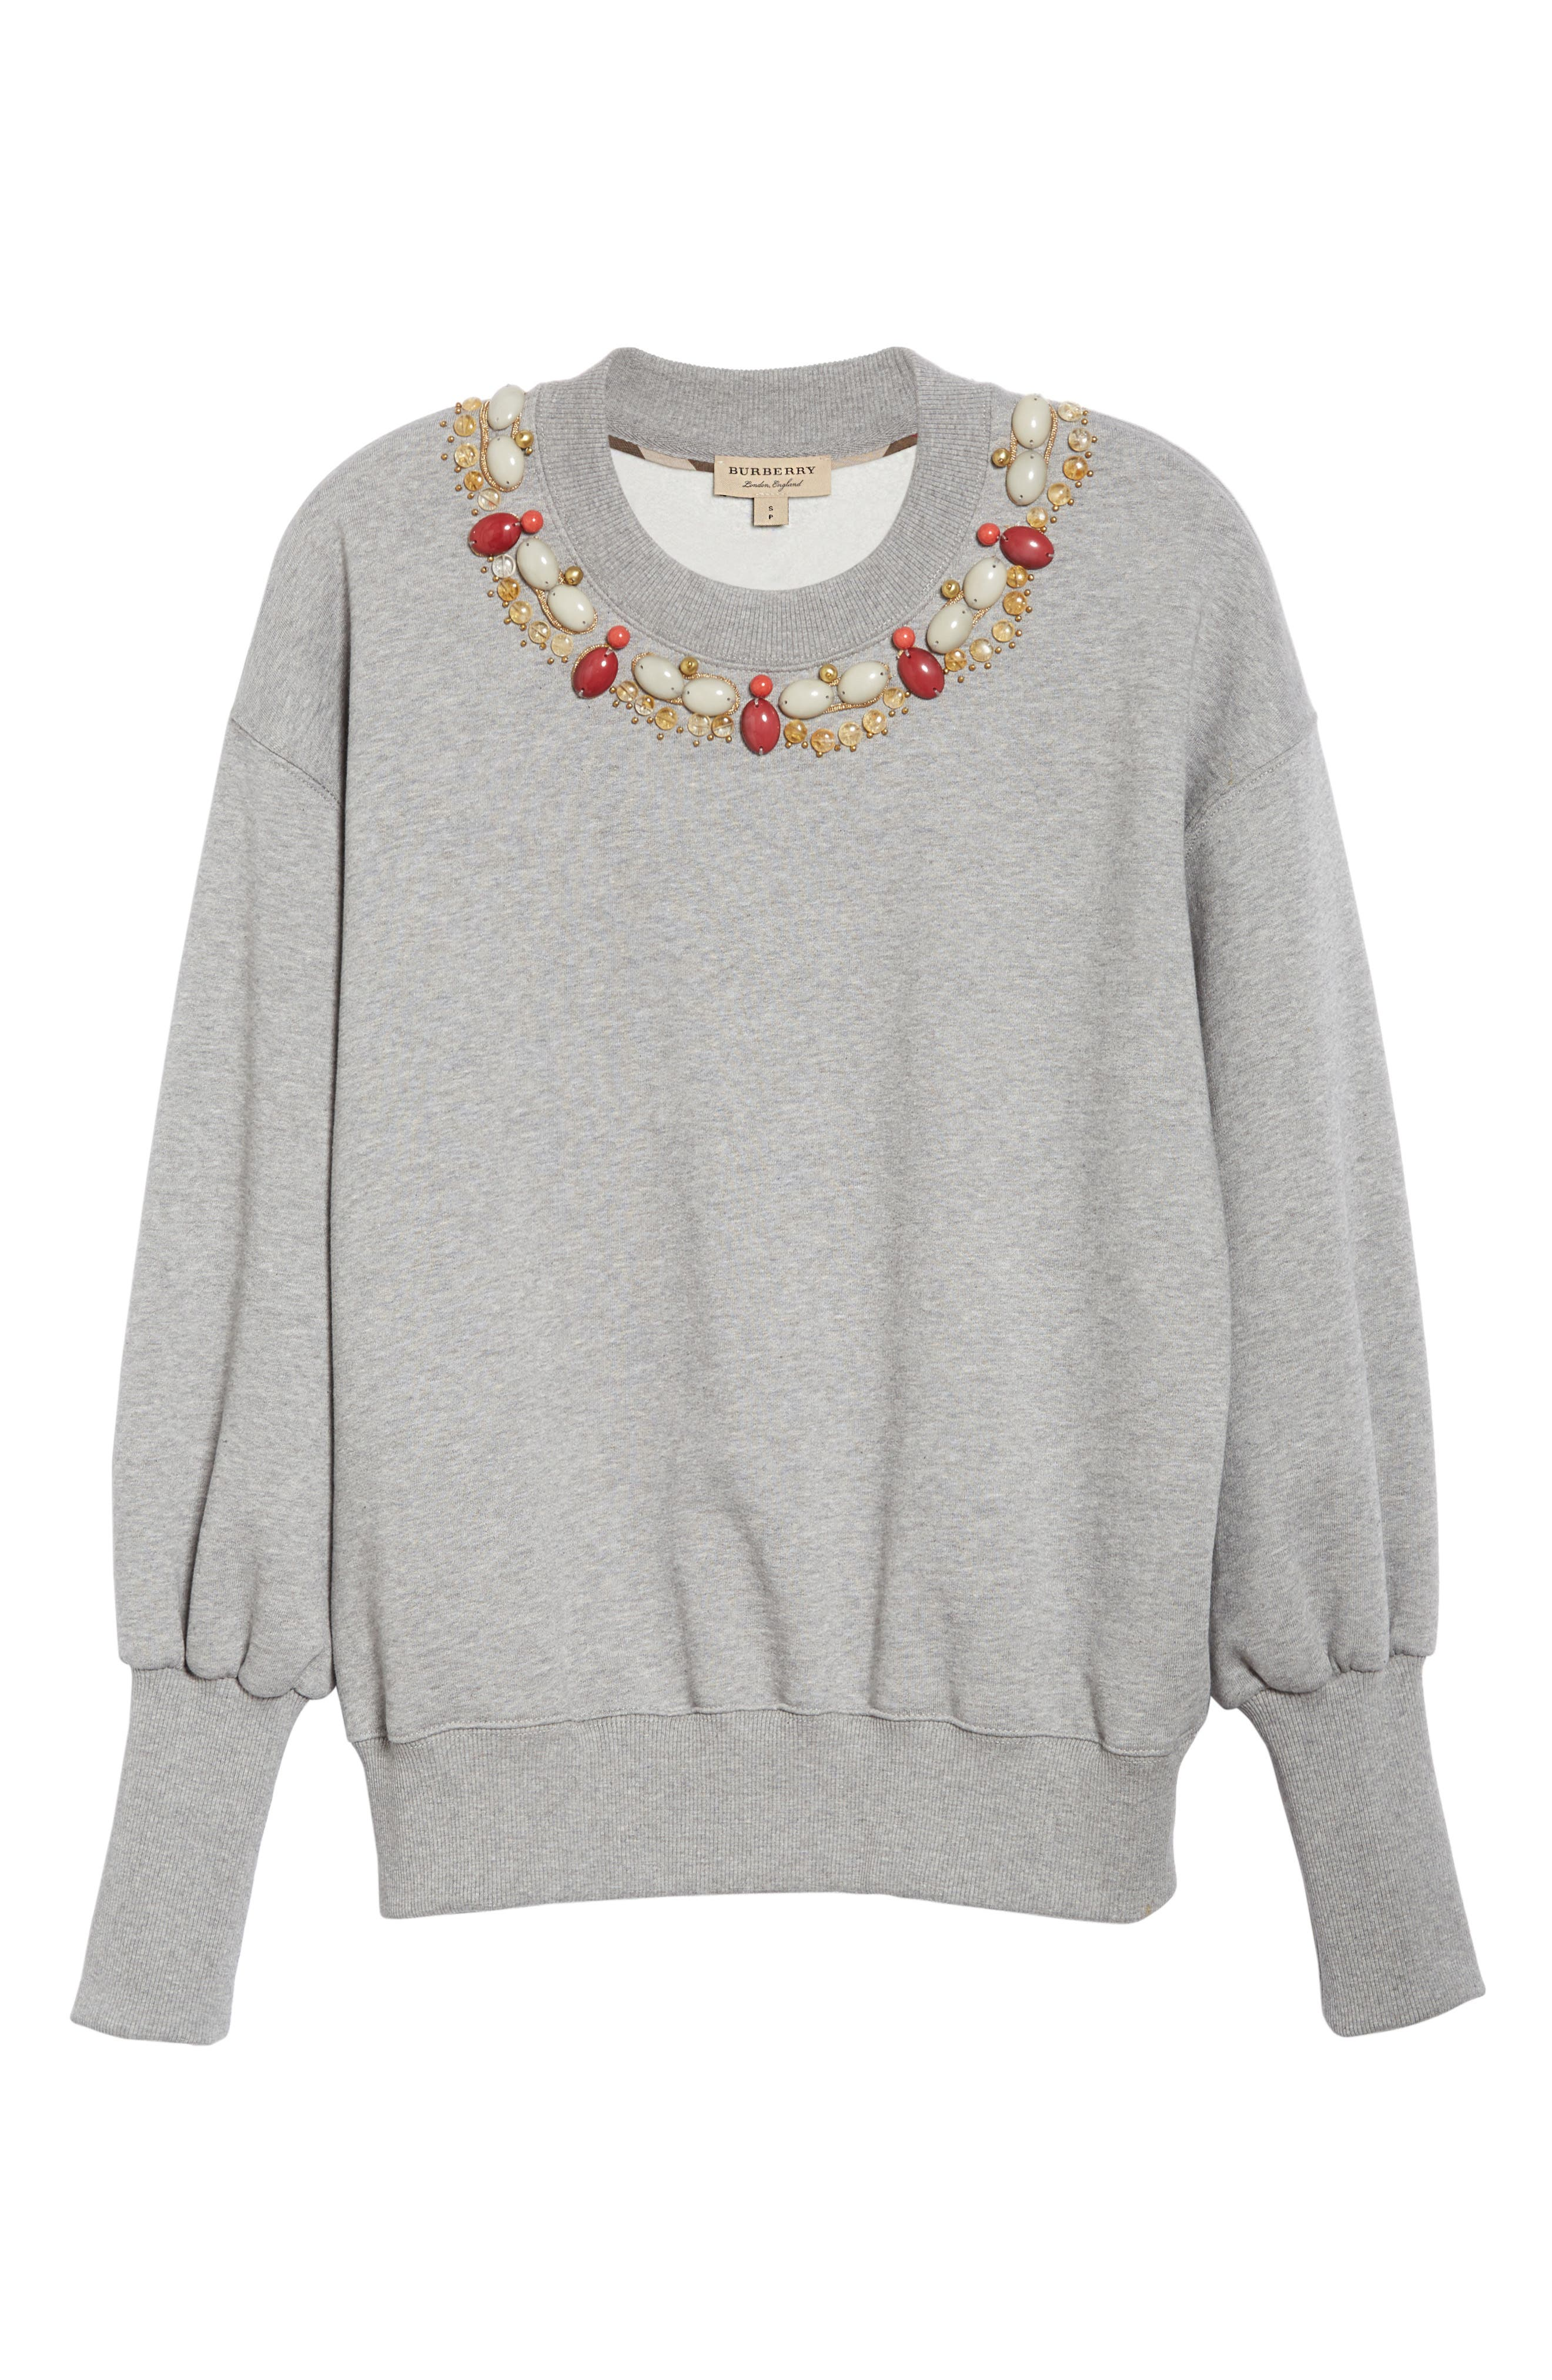 Juliano Embellished Sweatshirt,                             Alternate thumbnail 4, color,                             Pale Grey Melange